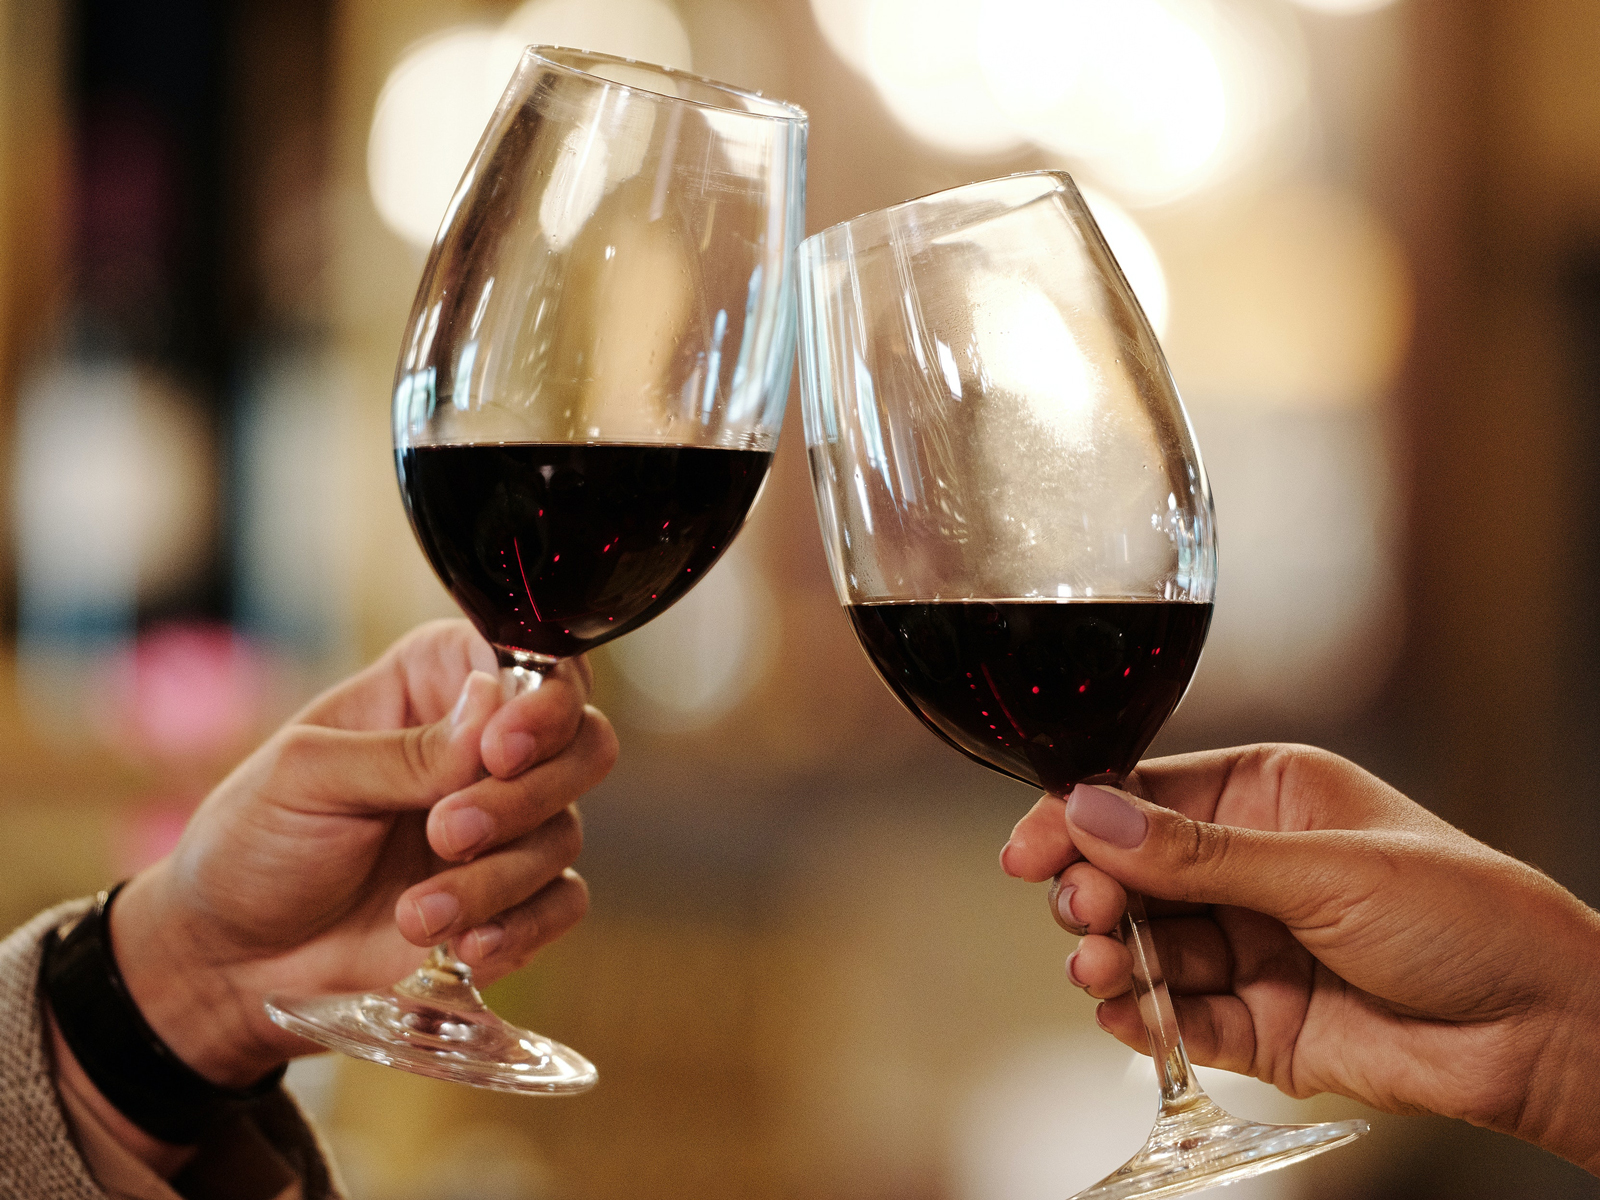 L'Aristophane, Vente de vins